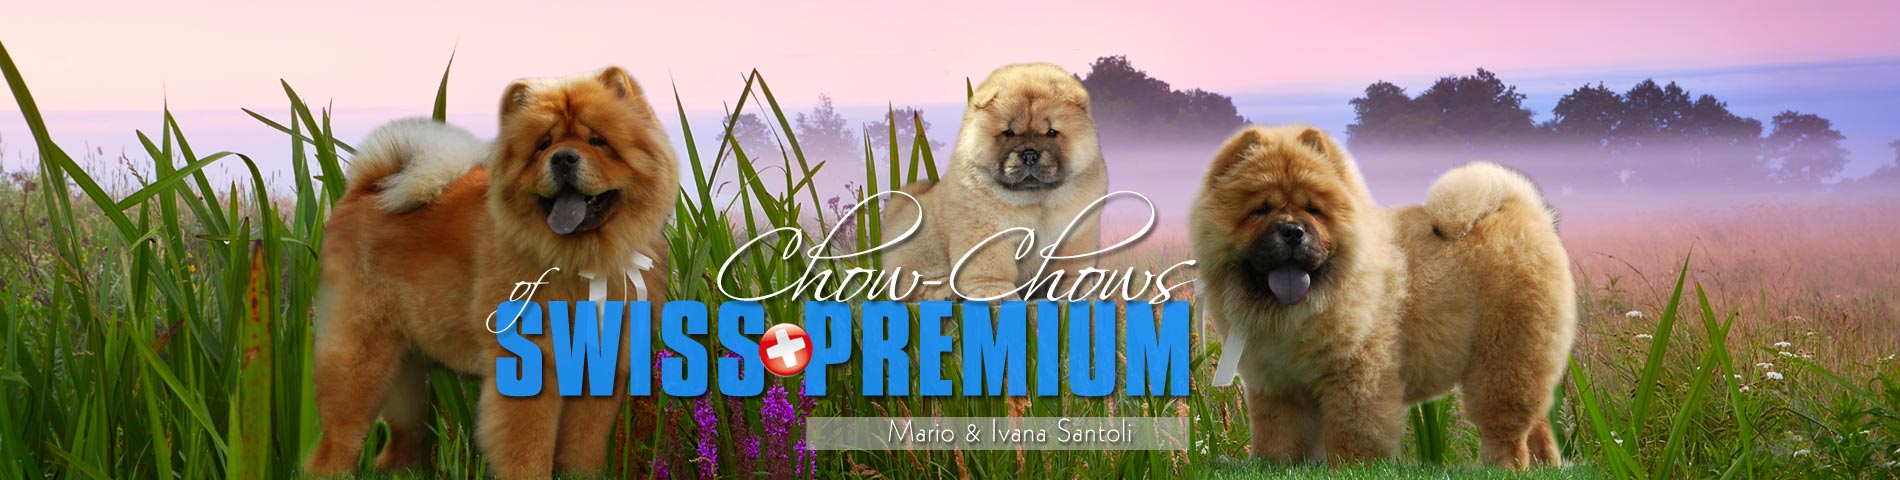 Of Swiss Premium Chow-Chows - Mario und Ivana Santoli, Schweiz